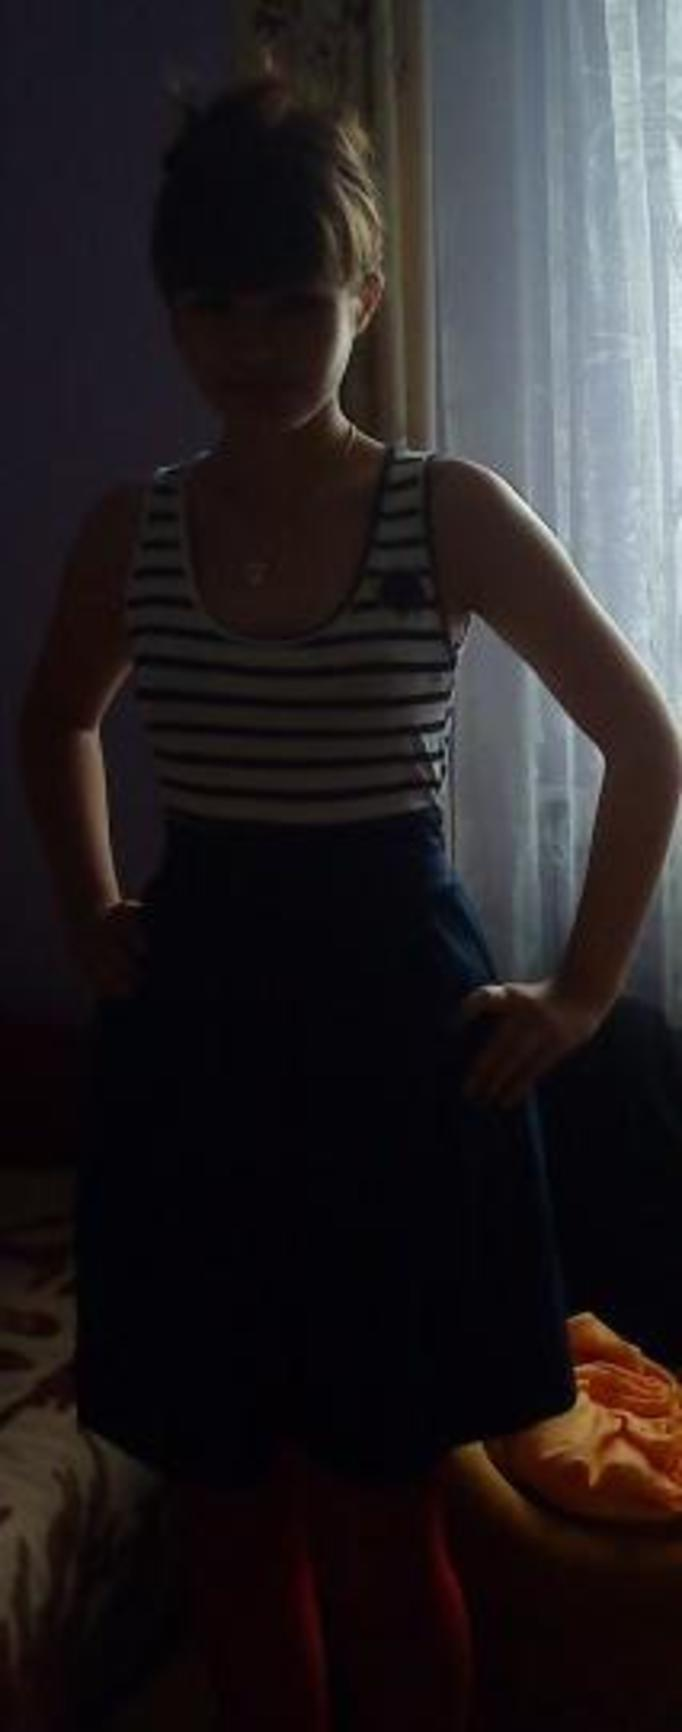 Moja ukochana sukienka!